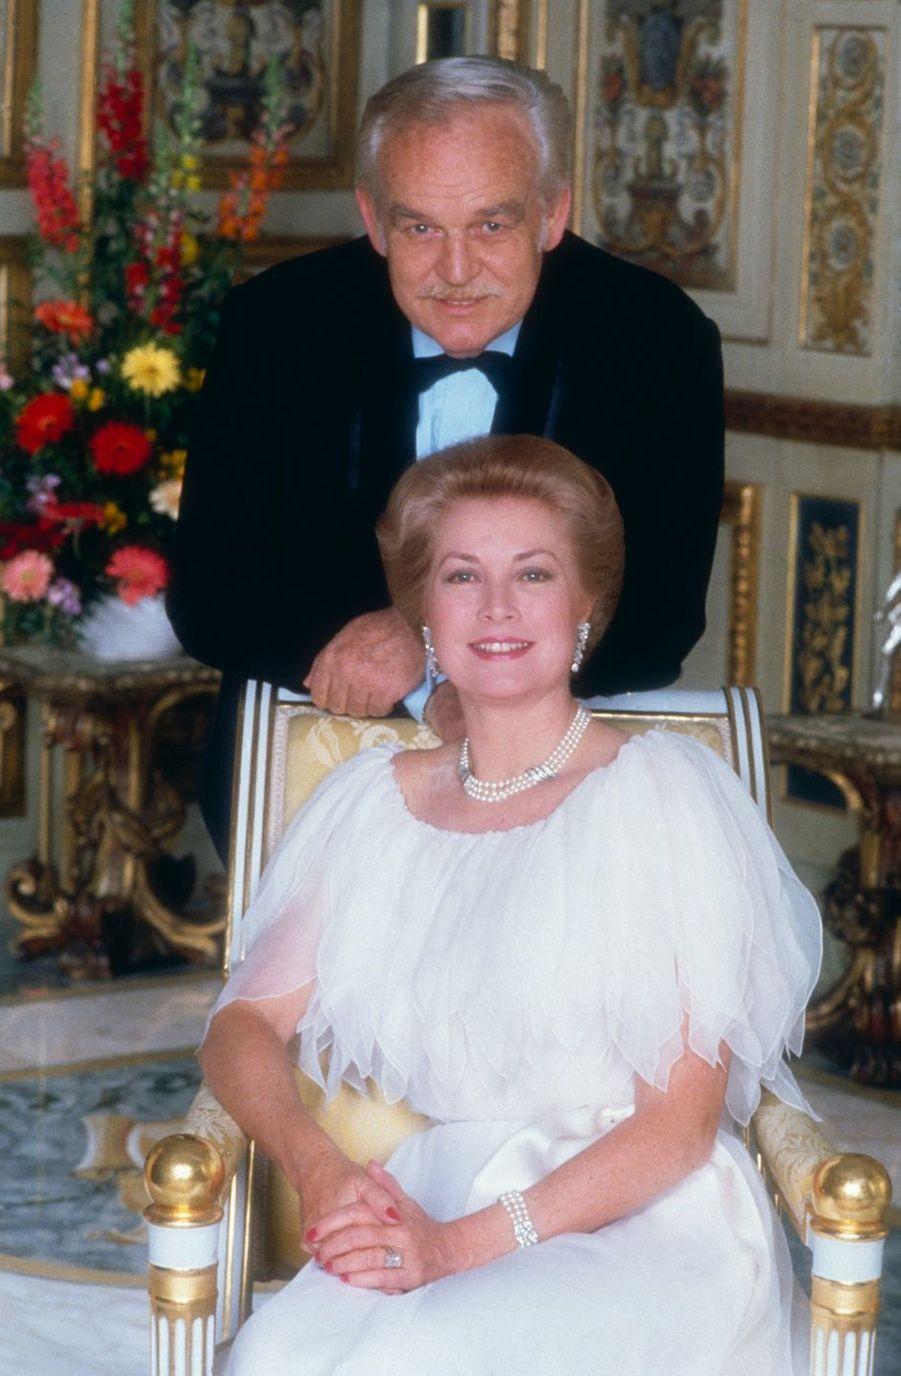 La princesse Grace et le prince Rainier III de Monaco, le 30 mars 1981